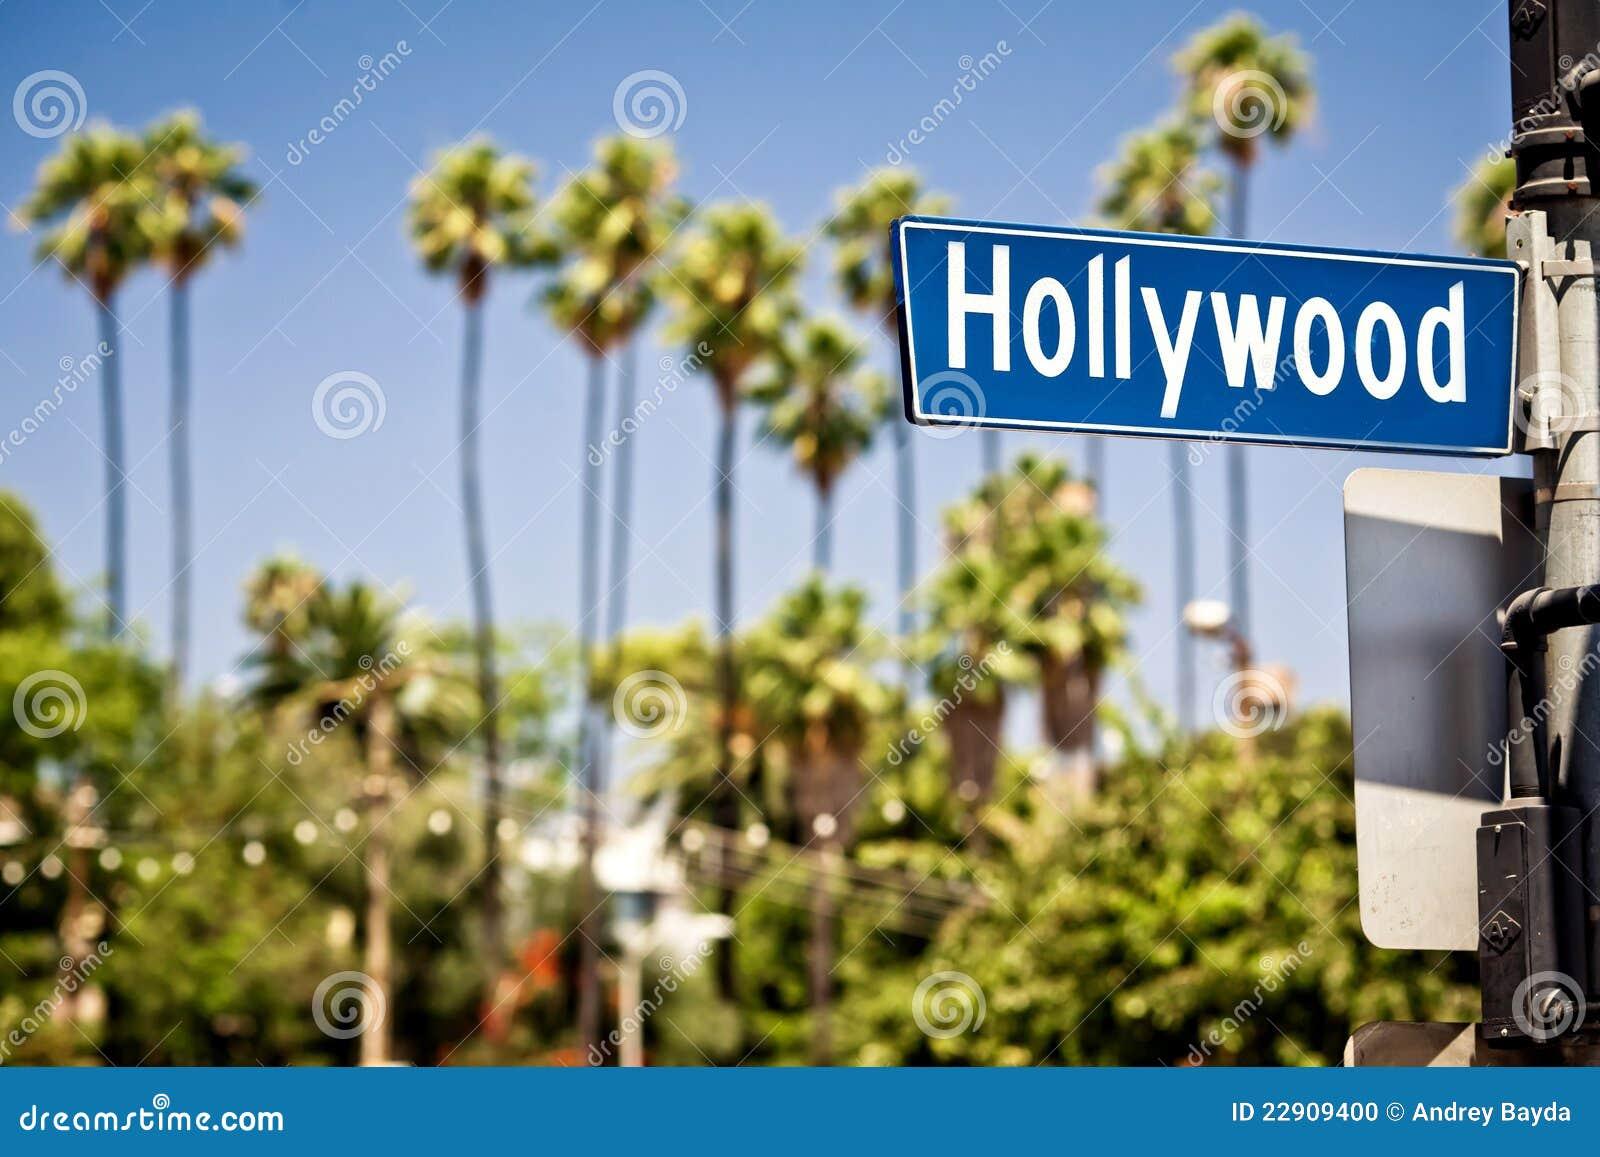 Hollywood latecken